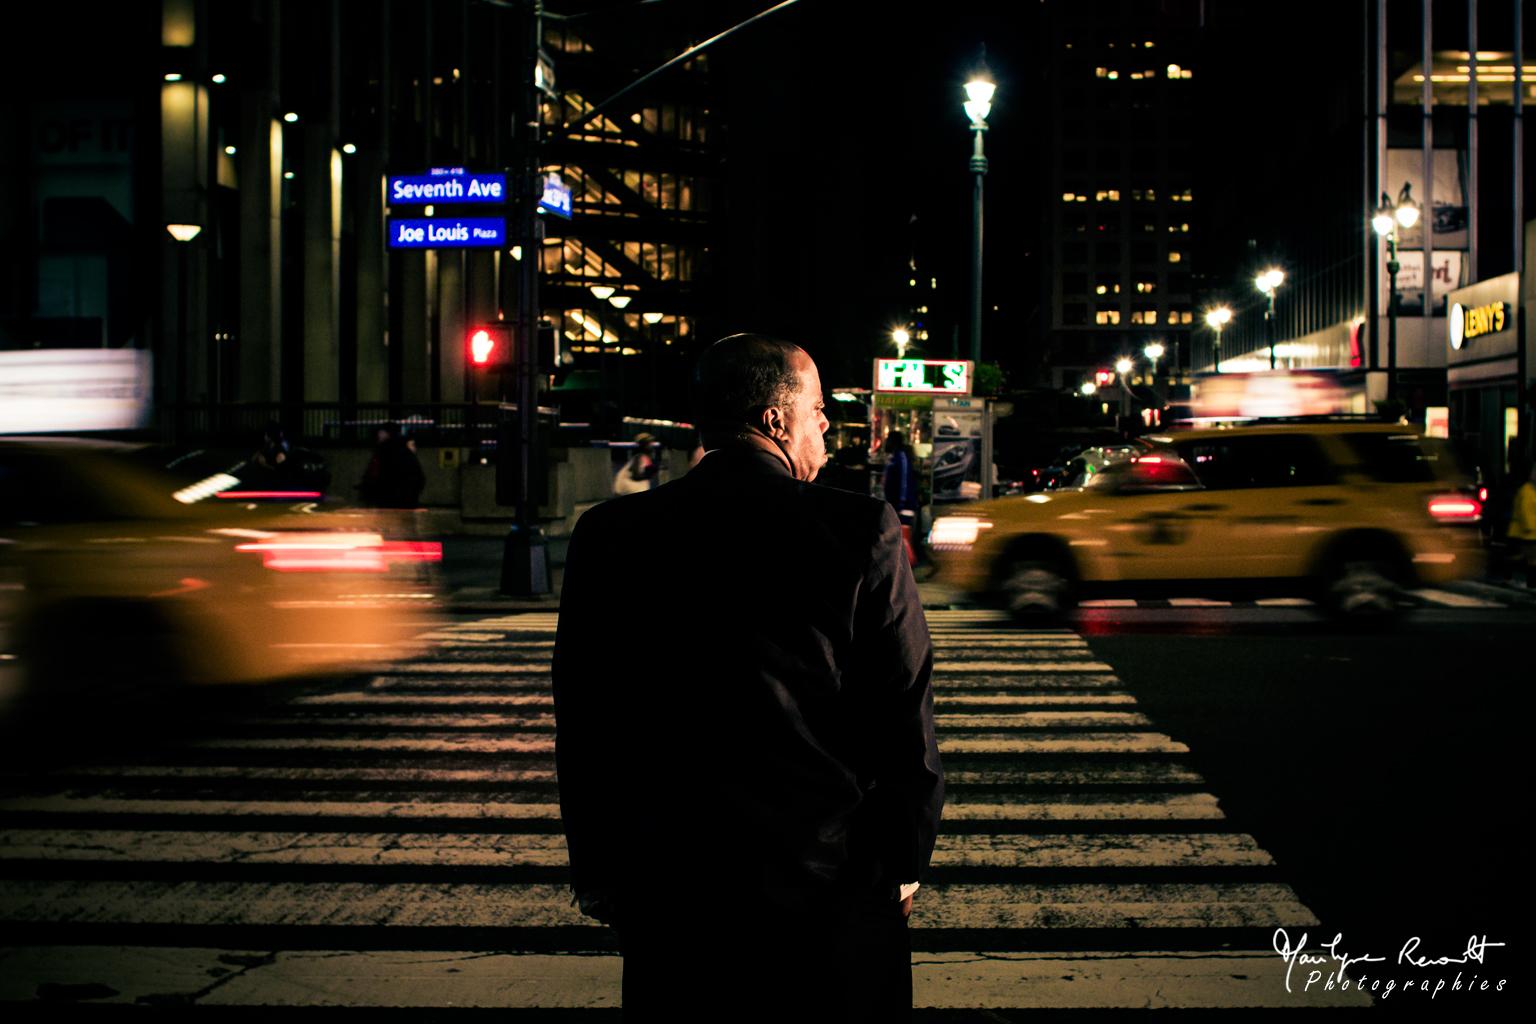 Marilyne Renoult Crosswalk-03